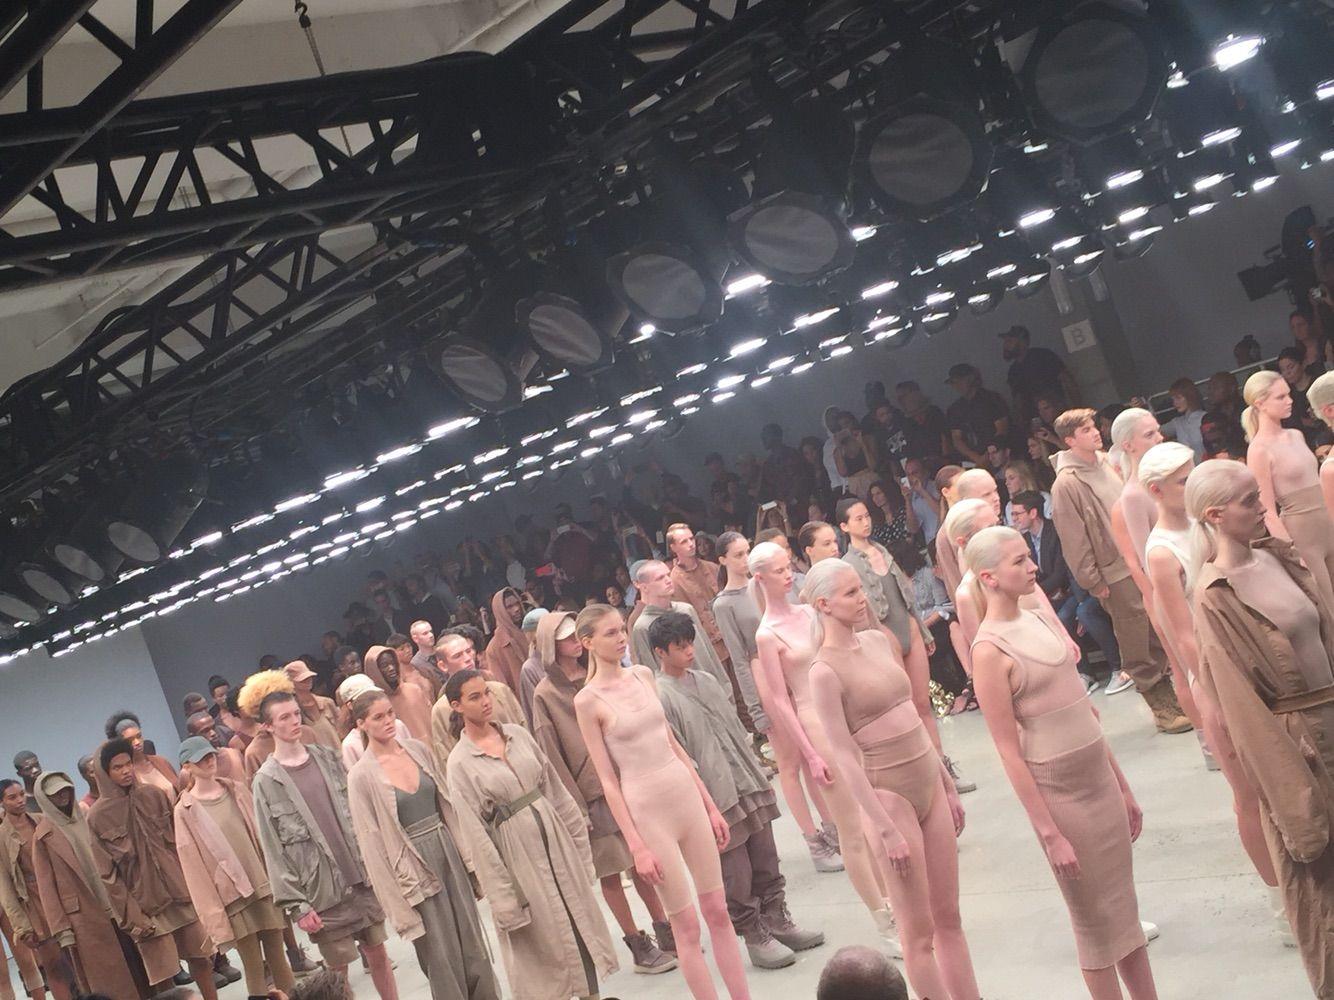 Nude fashion